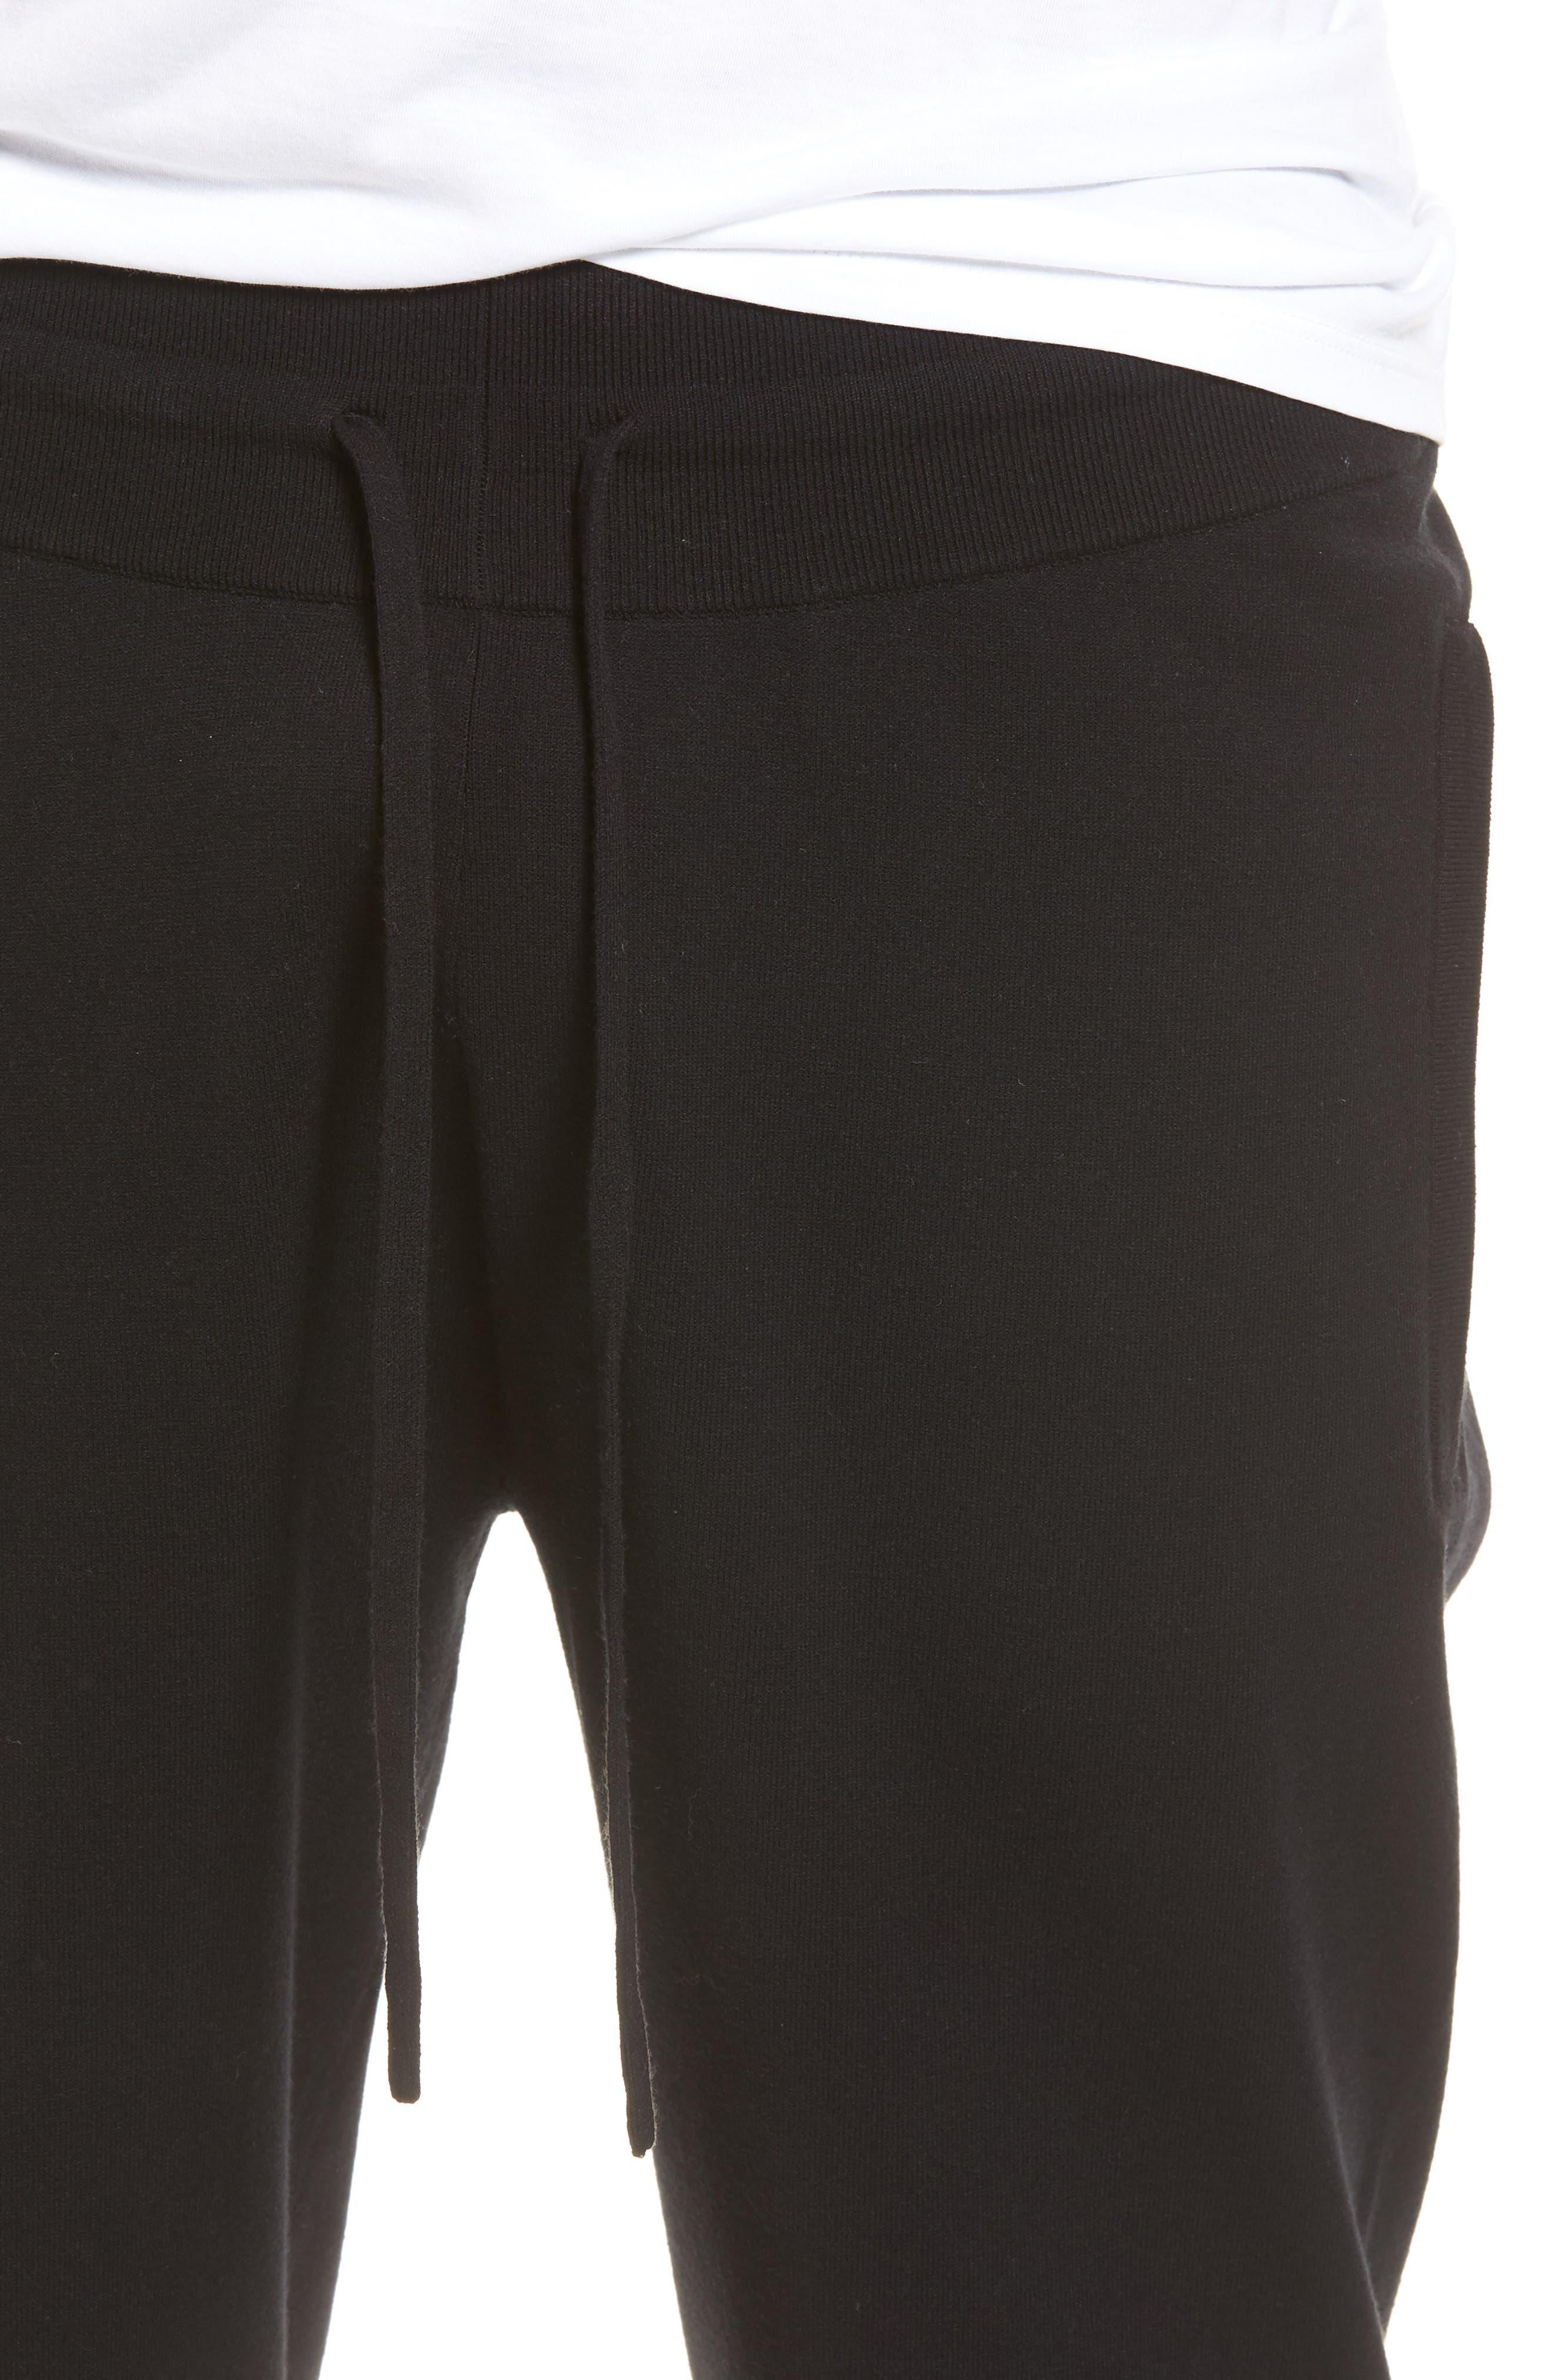 Slim Fit Jogger Pants,                             Alternate thumbnail 4, color,                             001